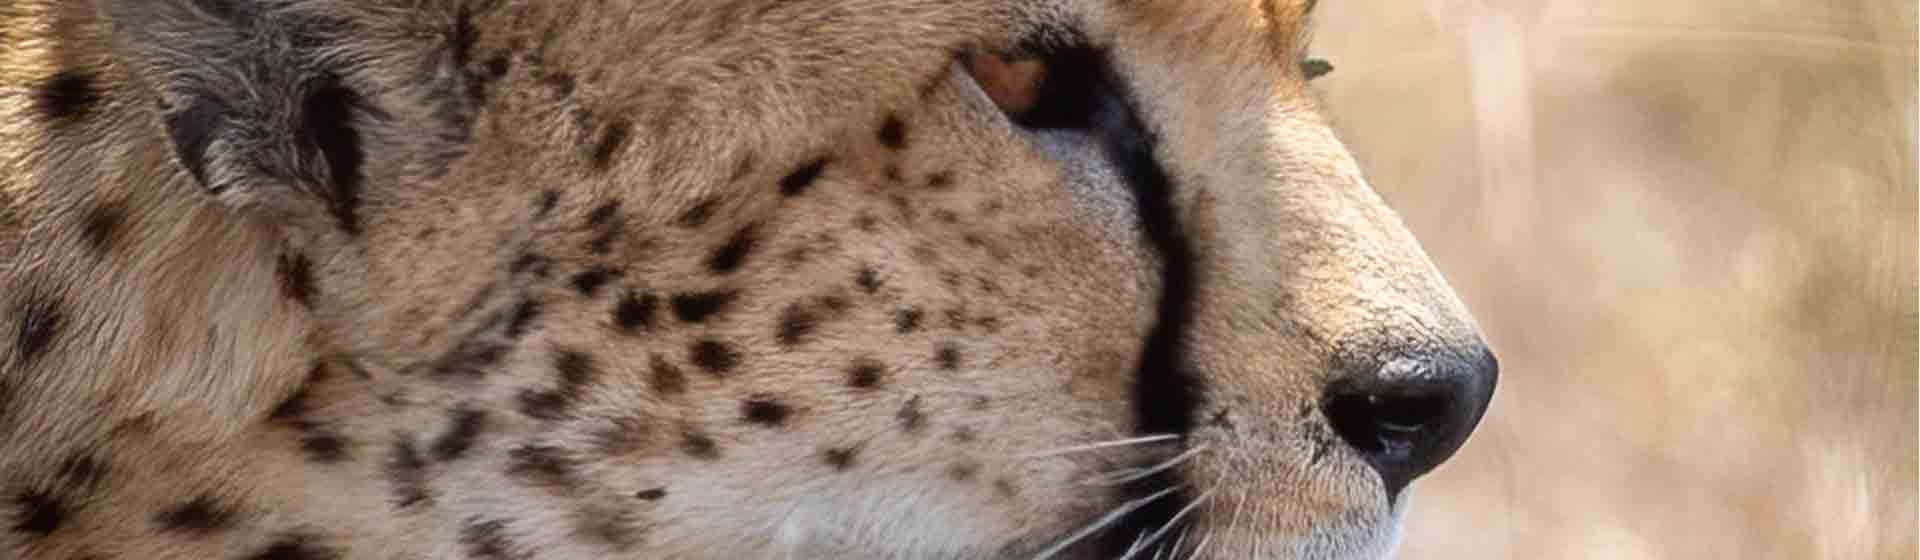 Masai Mara Luxury Lodge Safari